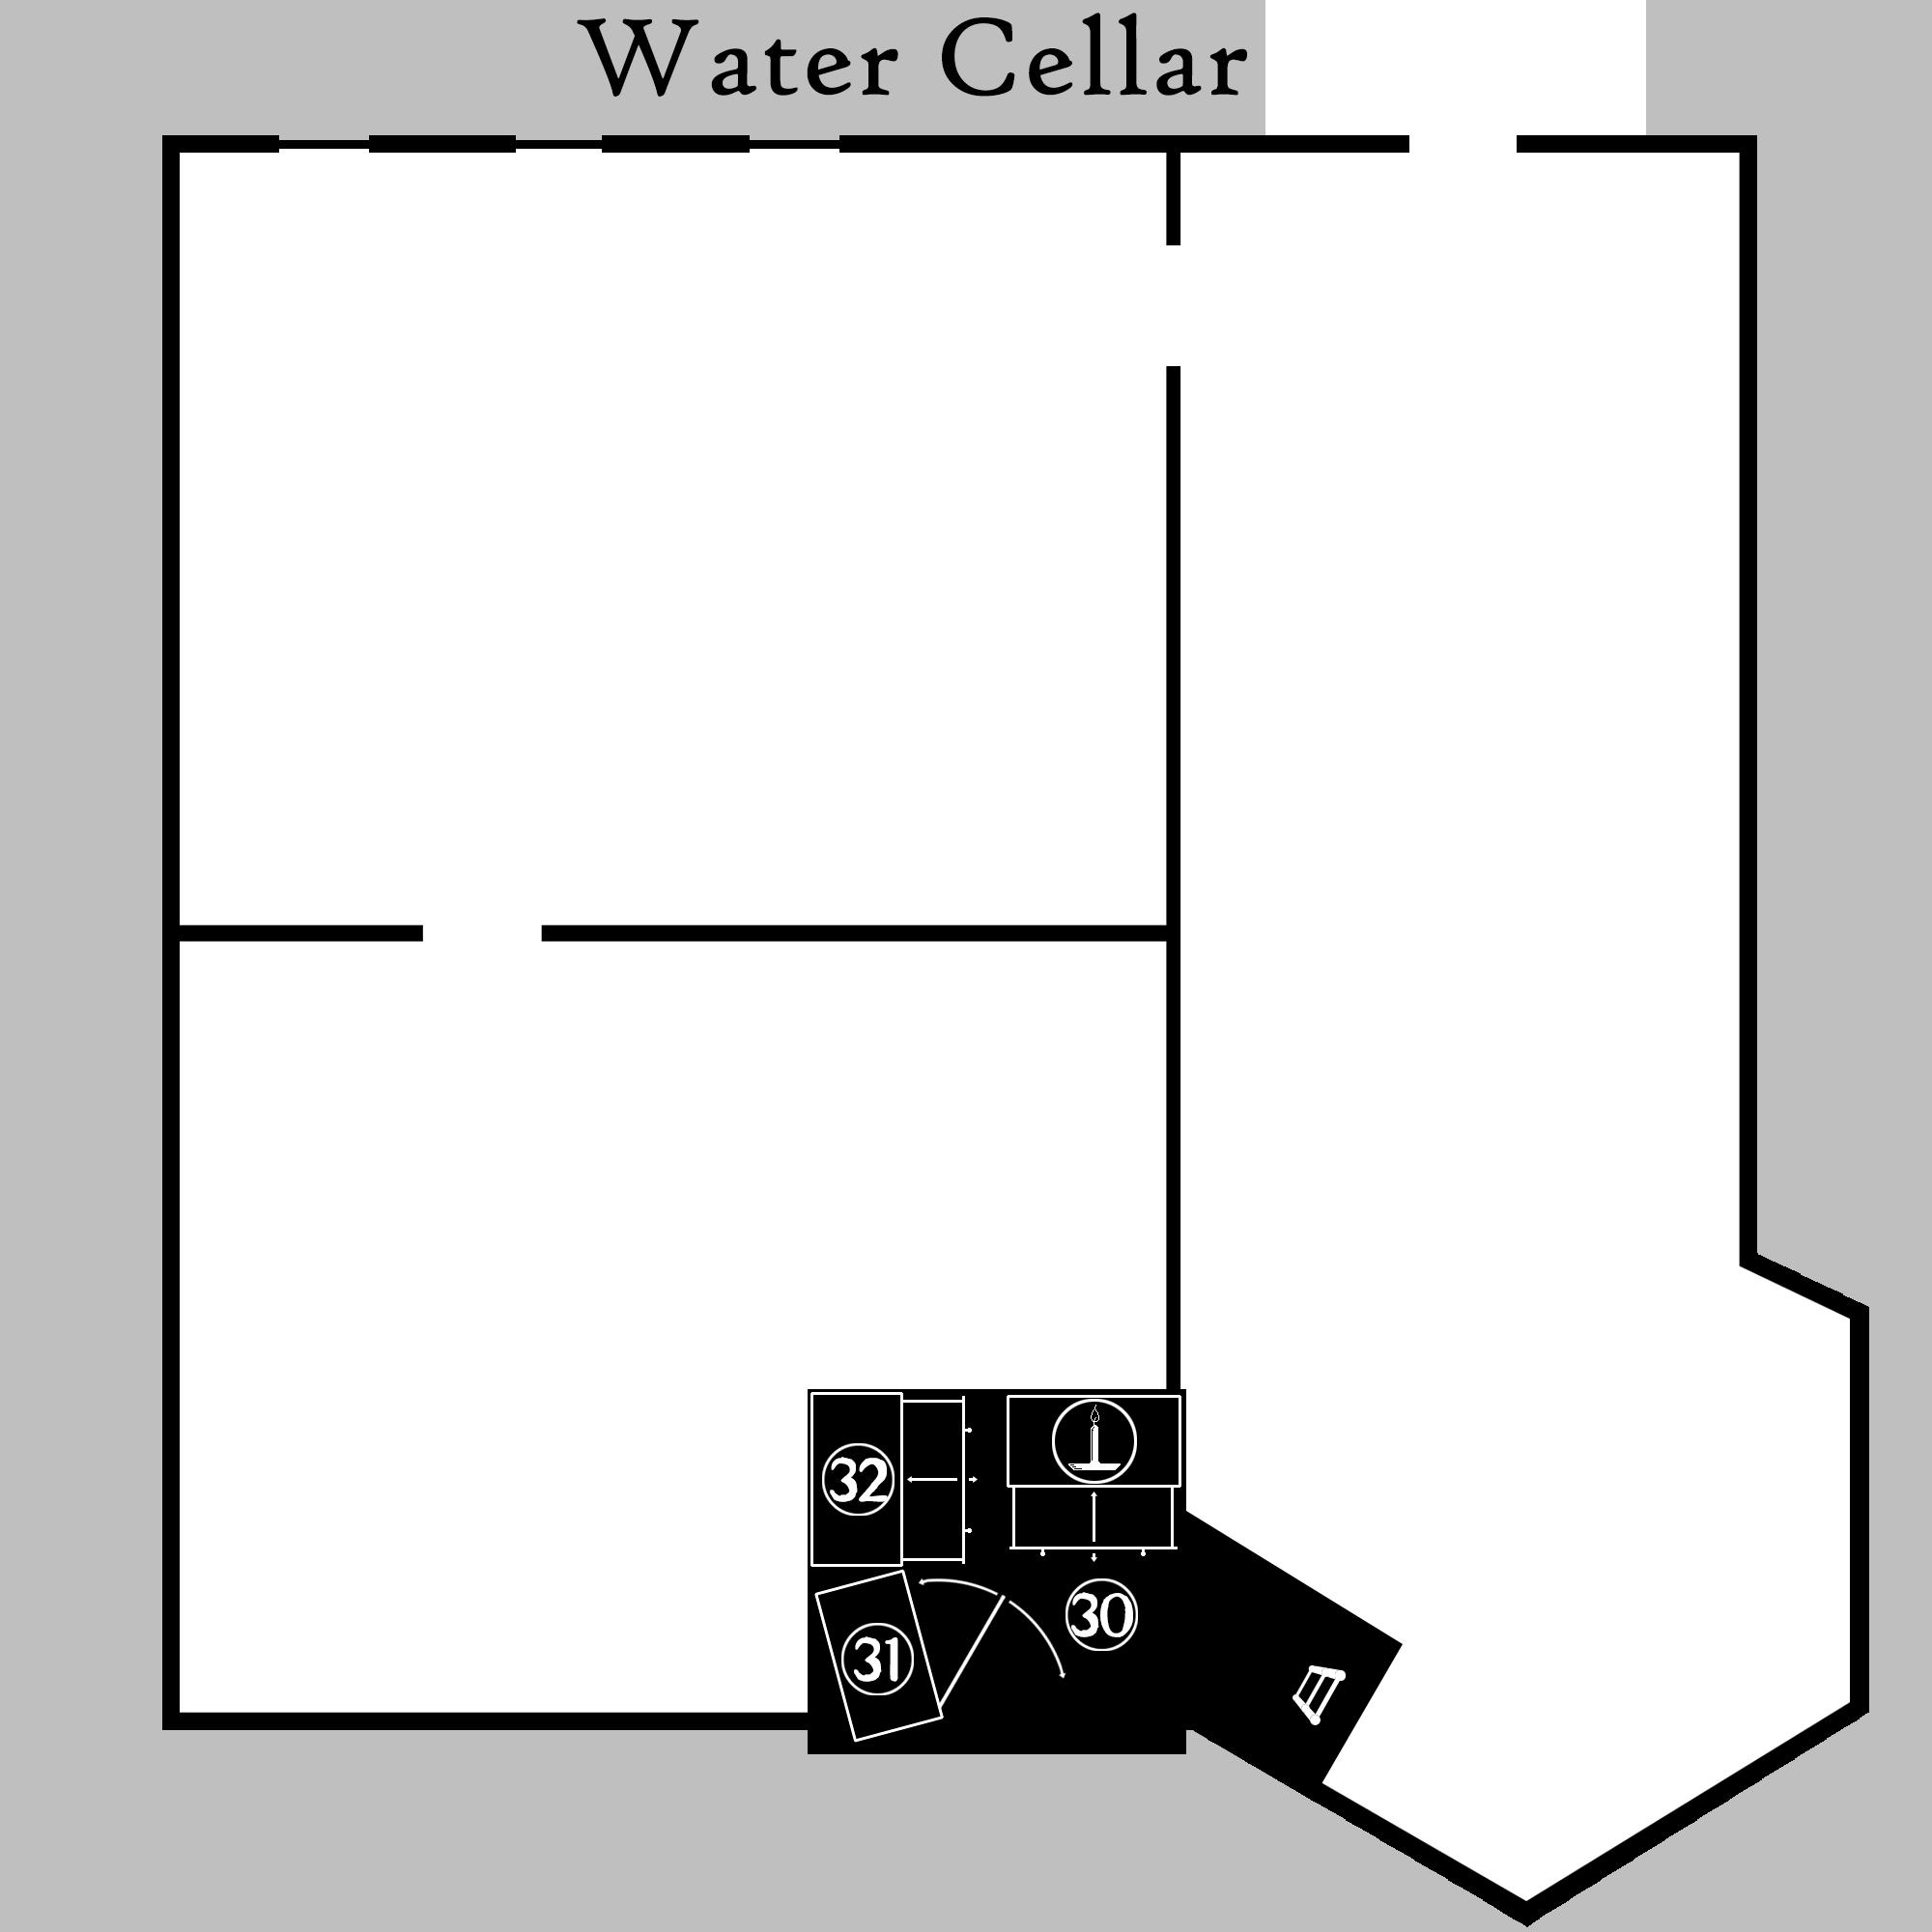 WaterCellar.png